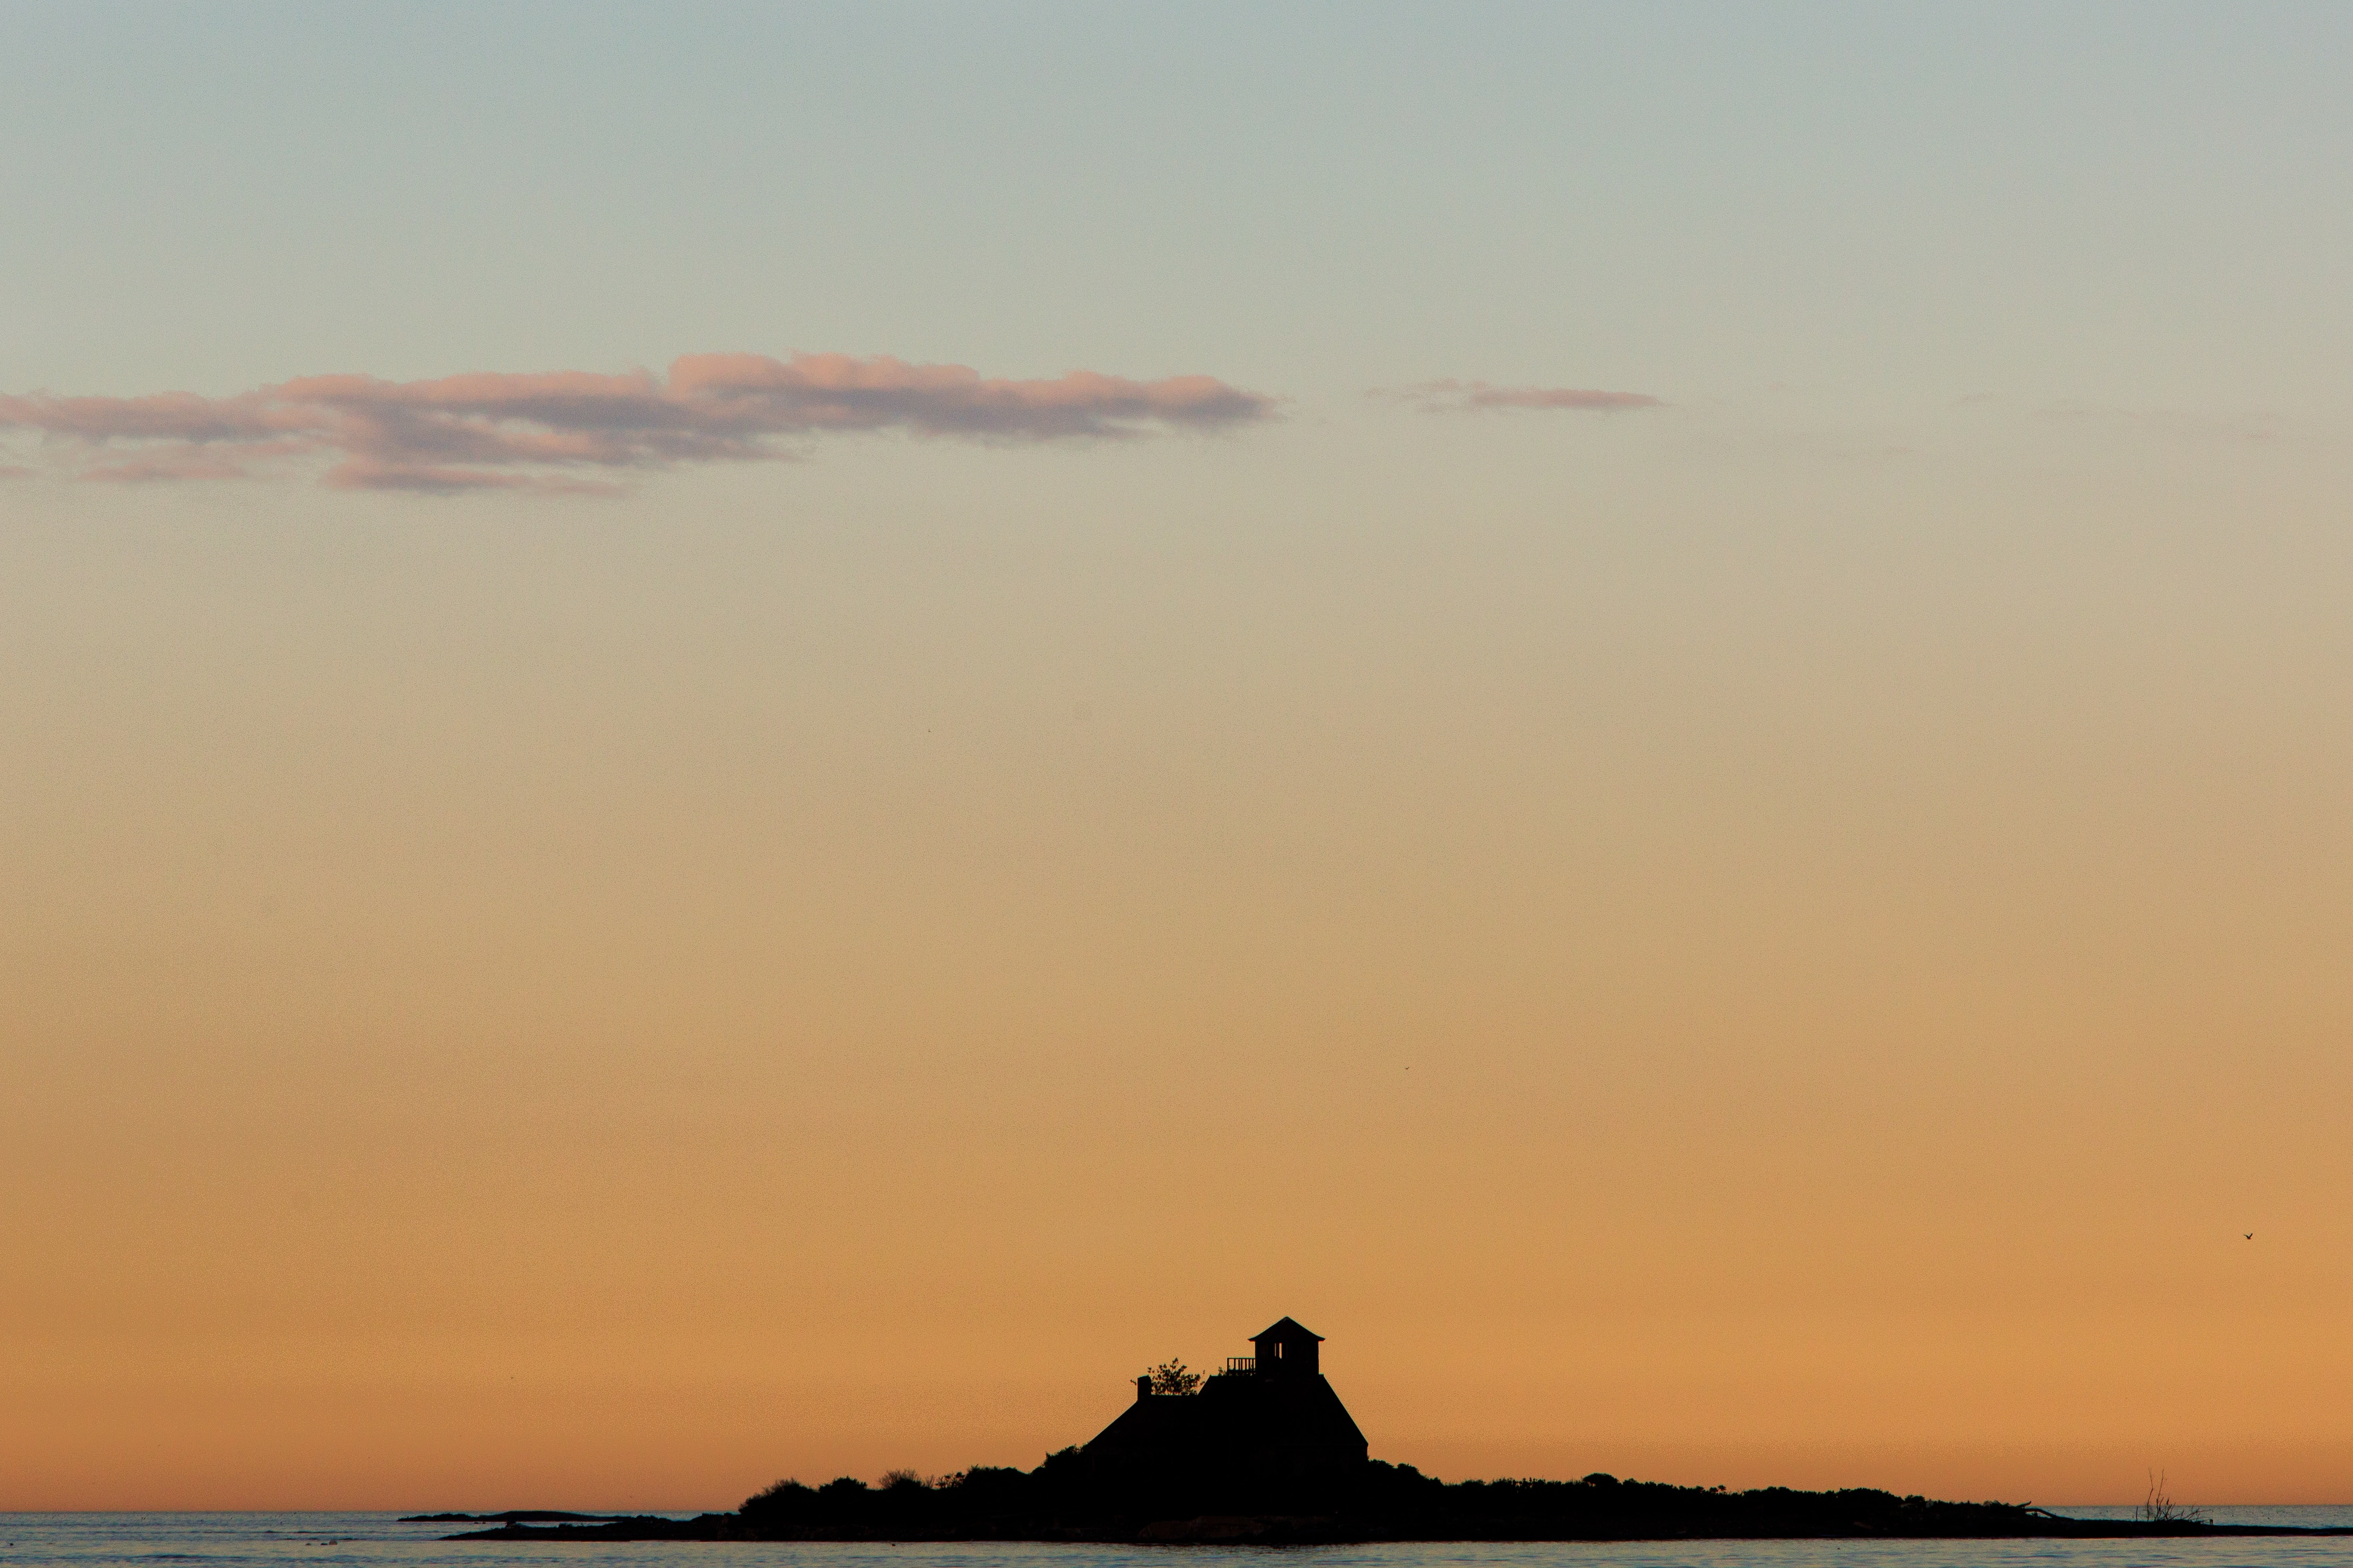 Island, Landscape, Ocean, River, Sea, HQ Photo